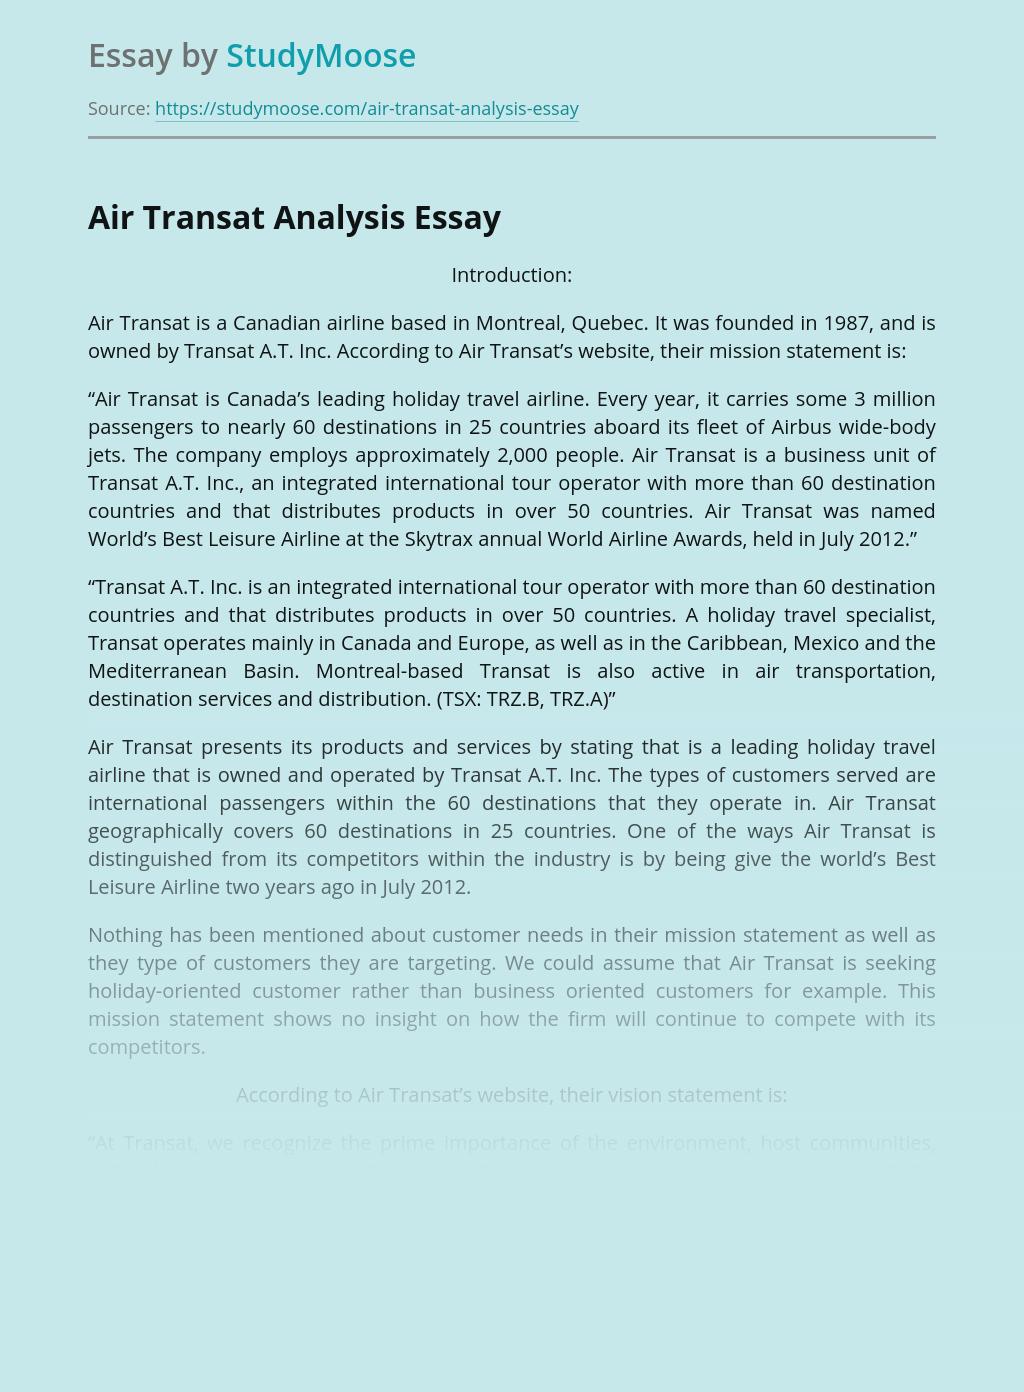 Air Transat Analysis